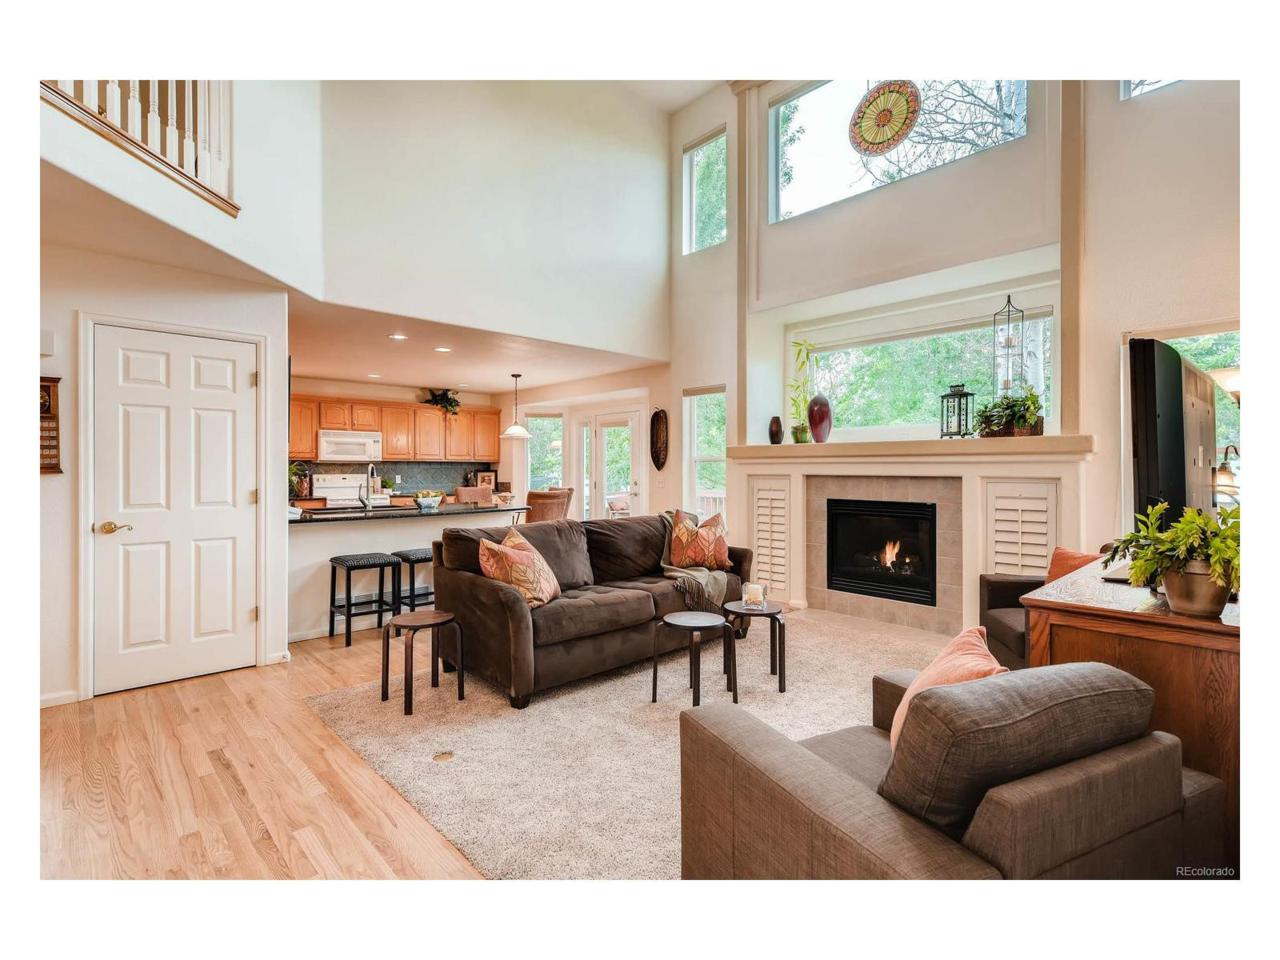 5160 Comanche Creek Way, Castle Rock, CO 80109 (MLS #9133347) :: 8z Real Estate